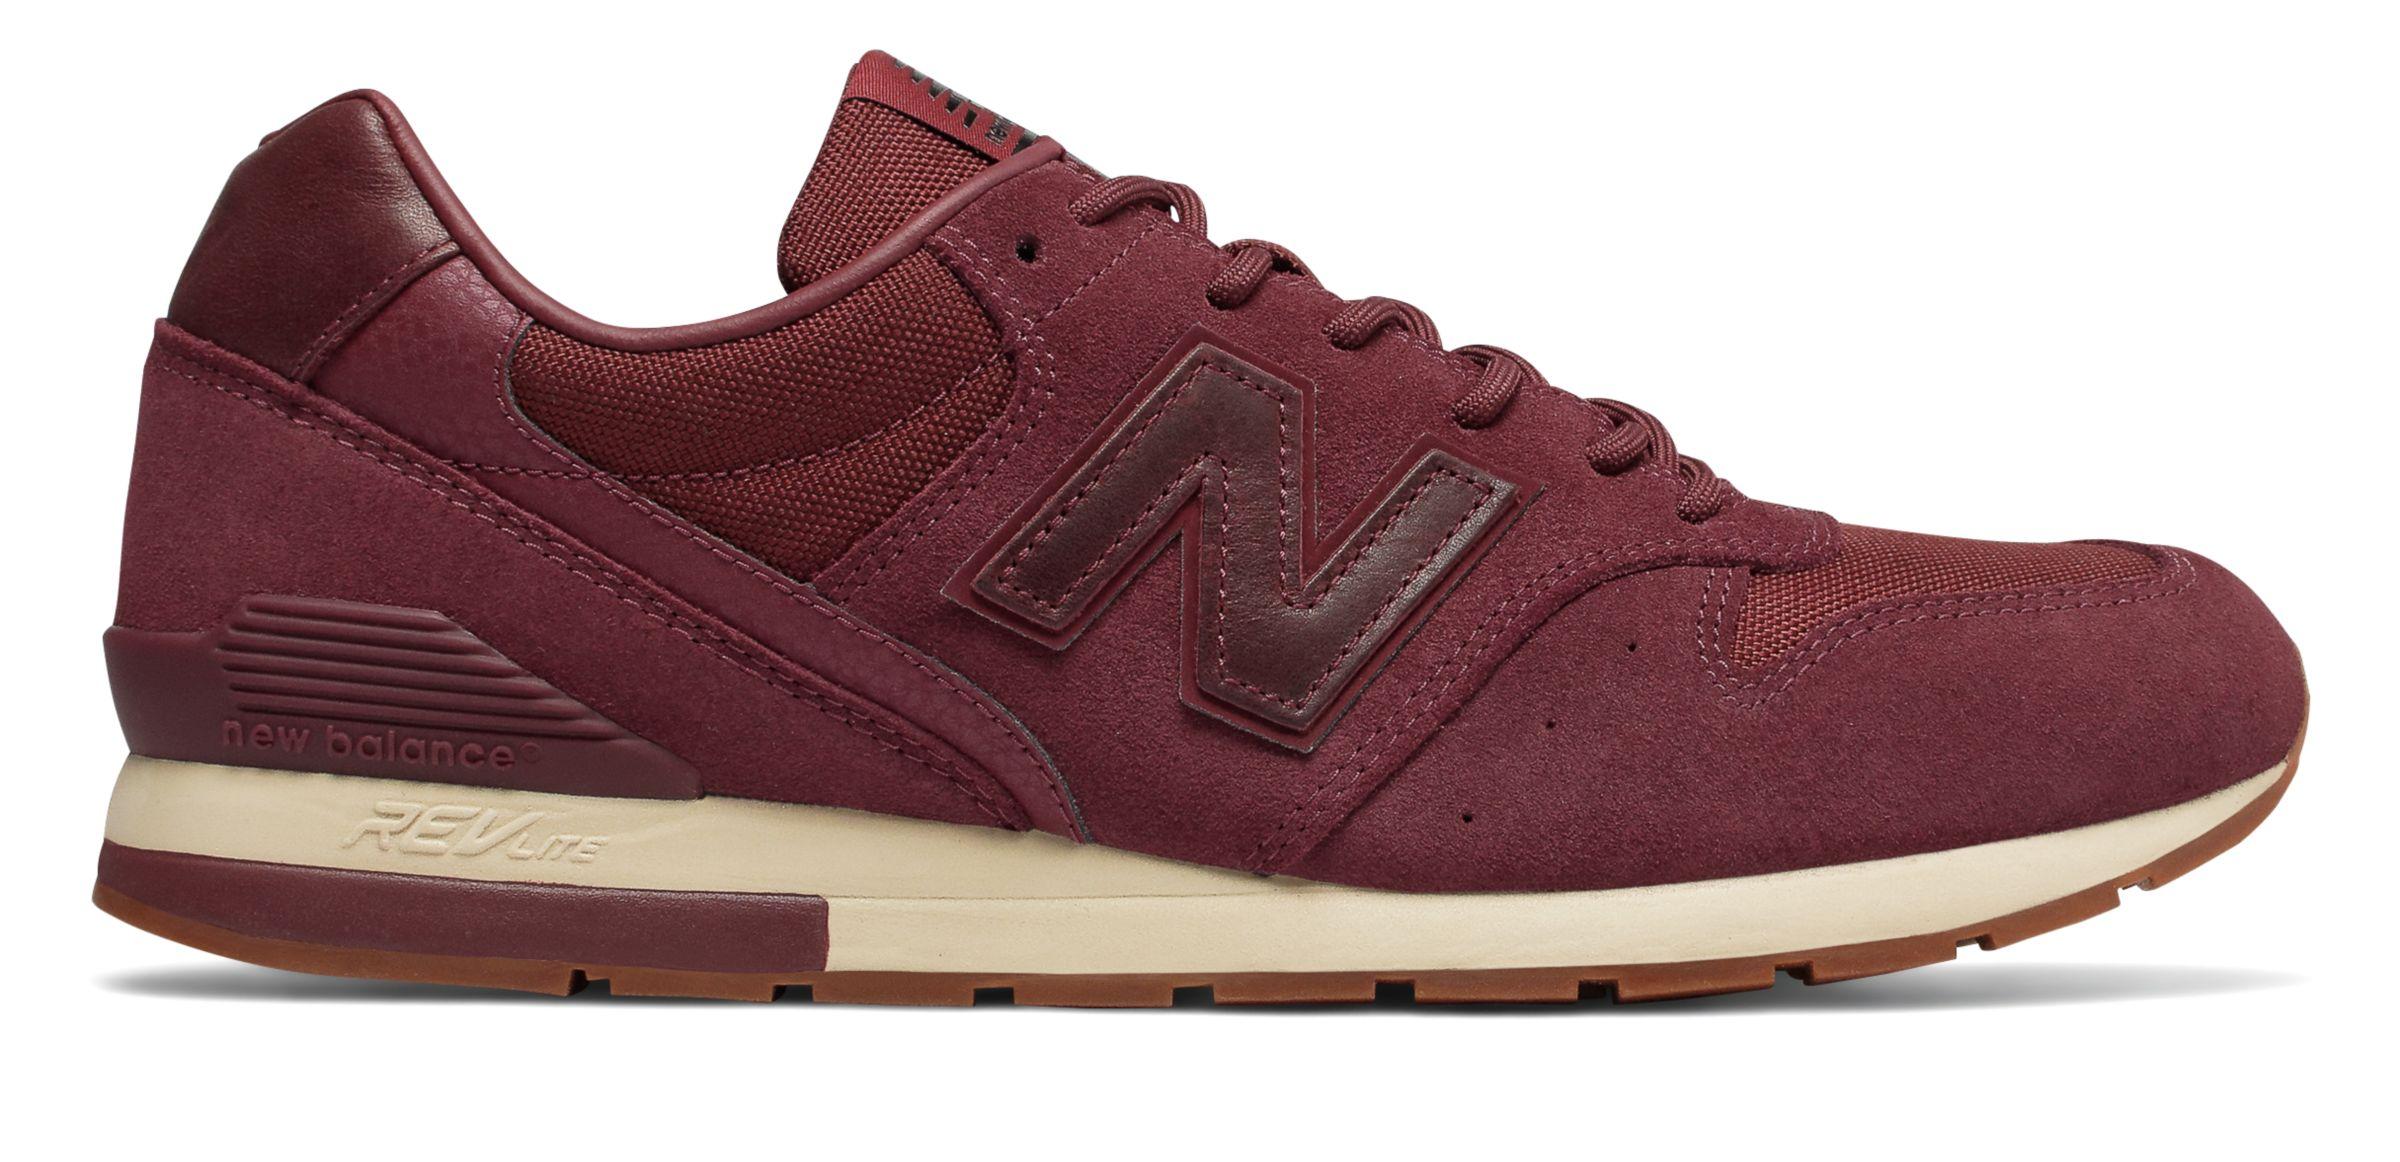 996 new balance marron